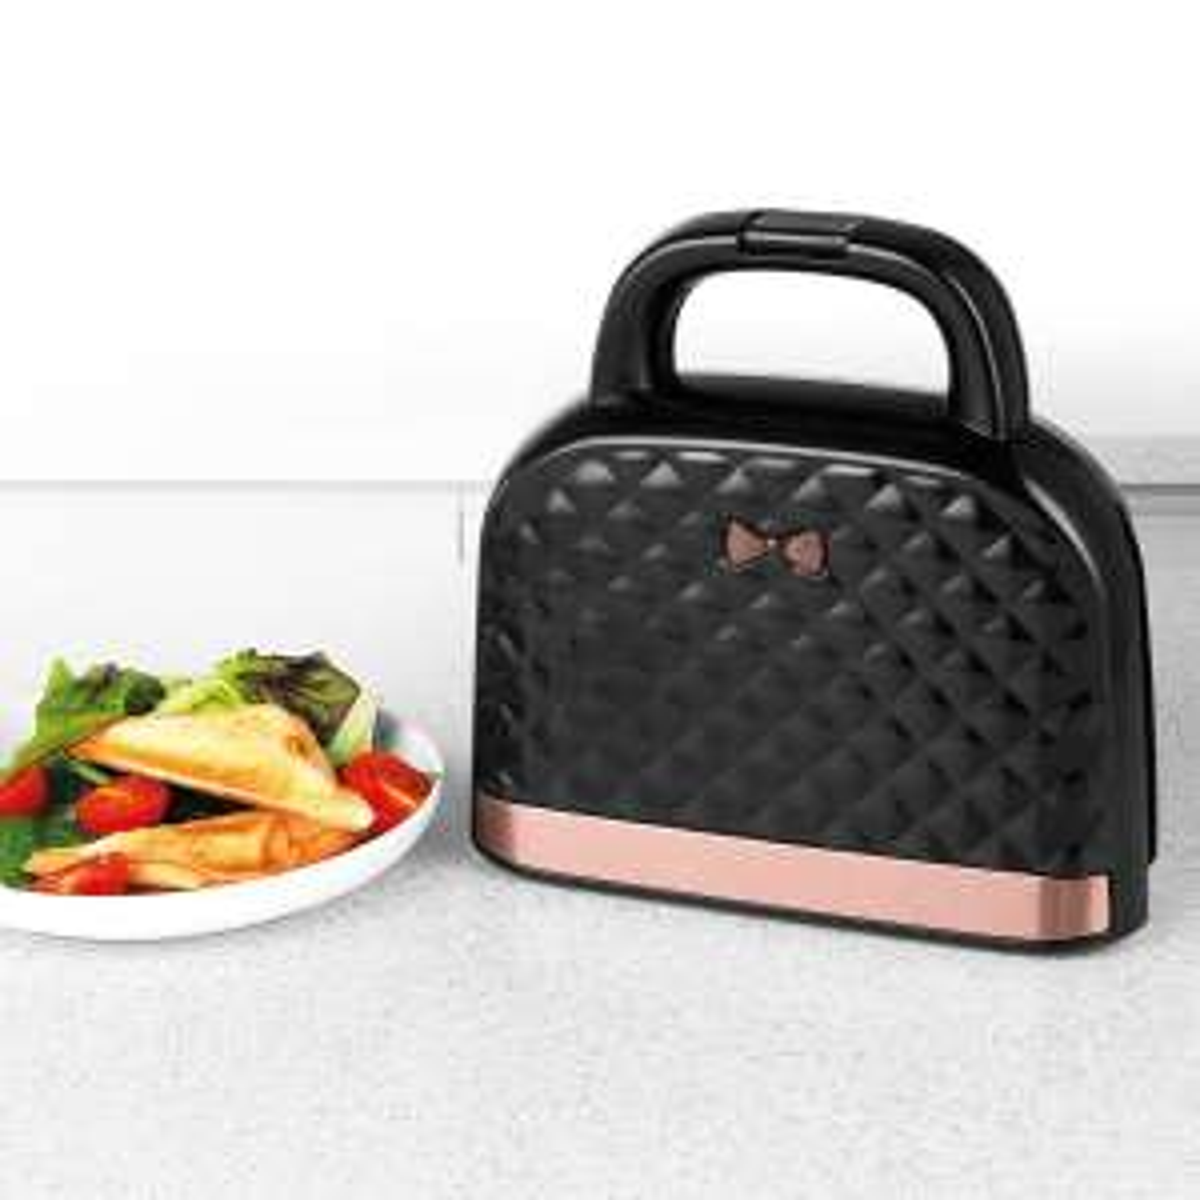 Salter EK3677 Handbag Style 2-Slice 750W Sandwich Toaster - Black and Rose Goldnow £25 Delivered @ Robert Dyas